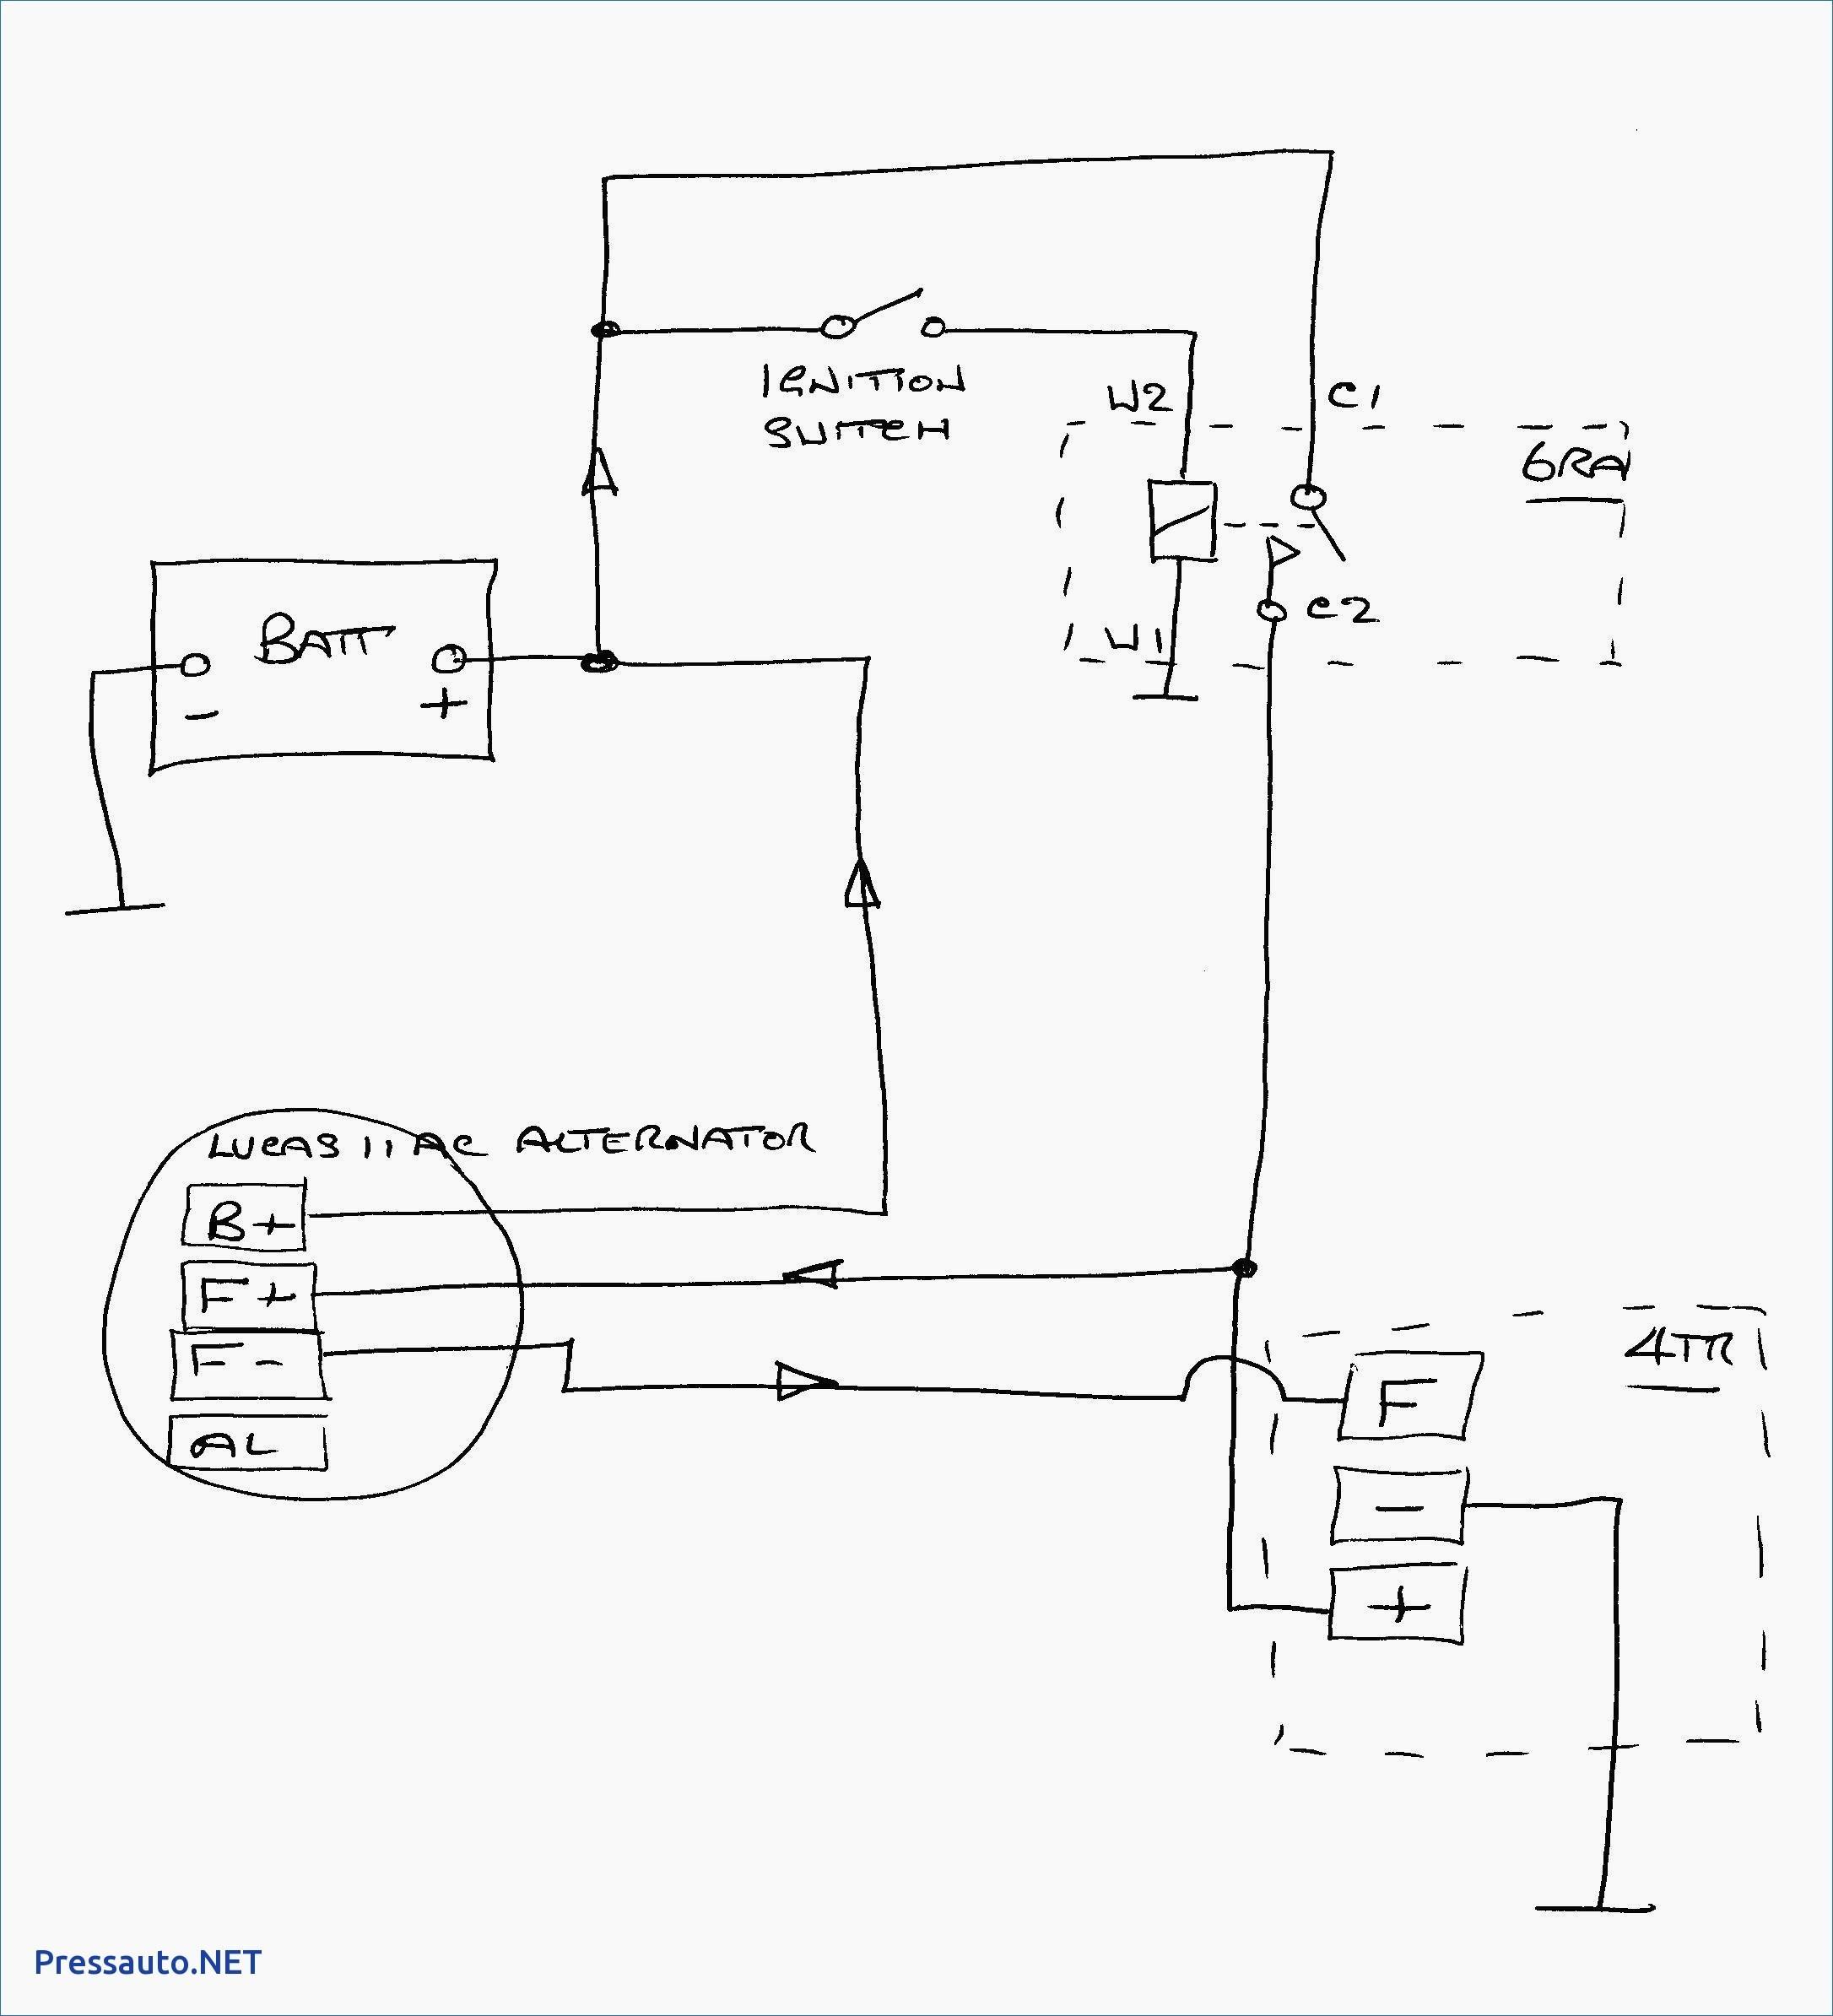 Valeo Wiper Motor Wiring Diagram - Painless Wiring Diagram Hei Dist for Wiring  Diagram Schematics | Audi Valeo Wiring Diagram |  | Wiring Diagram Schematics